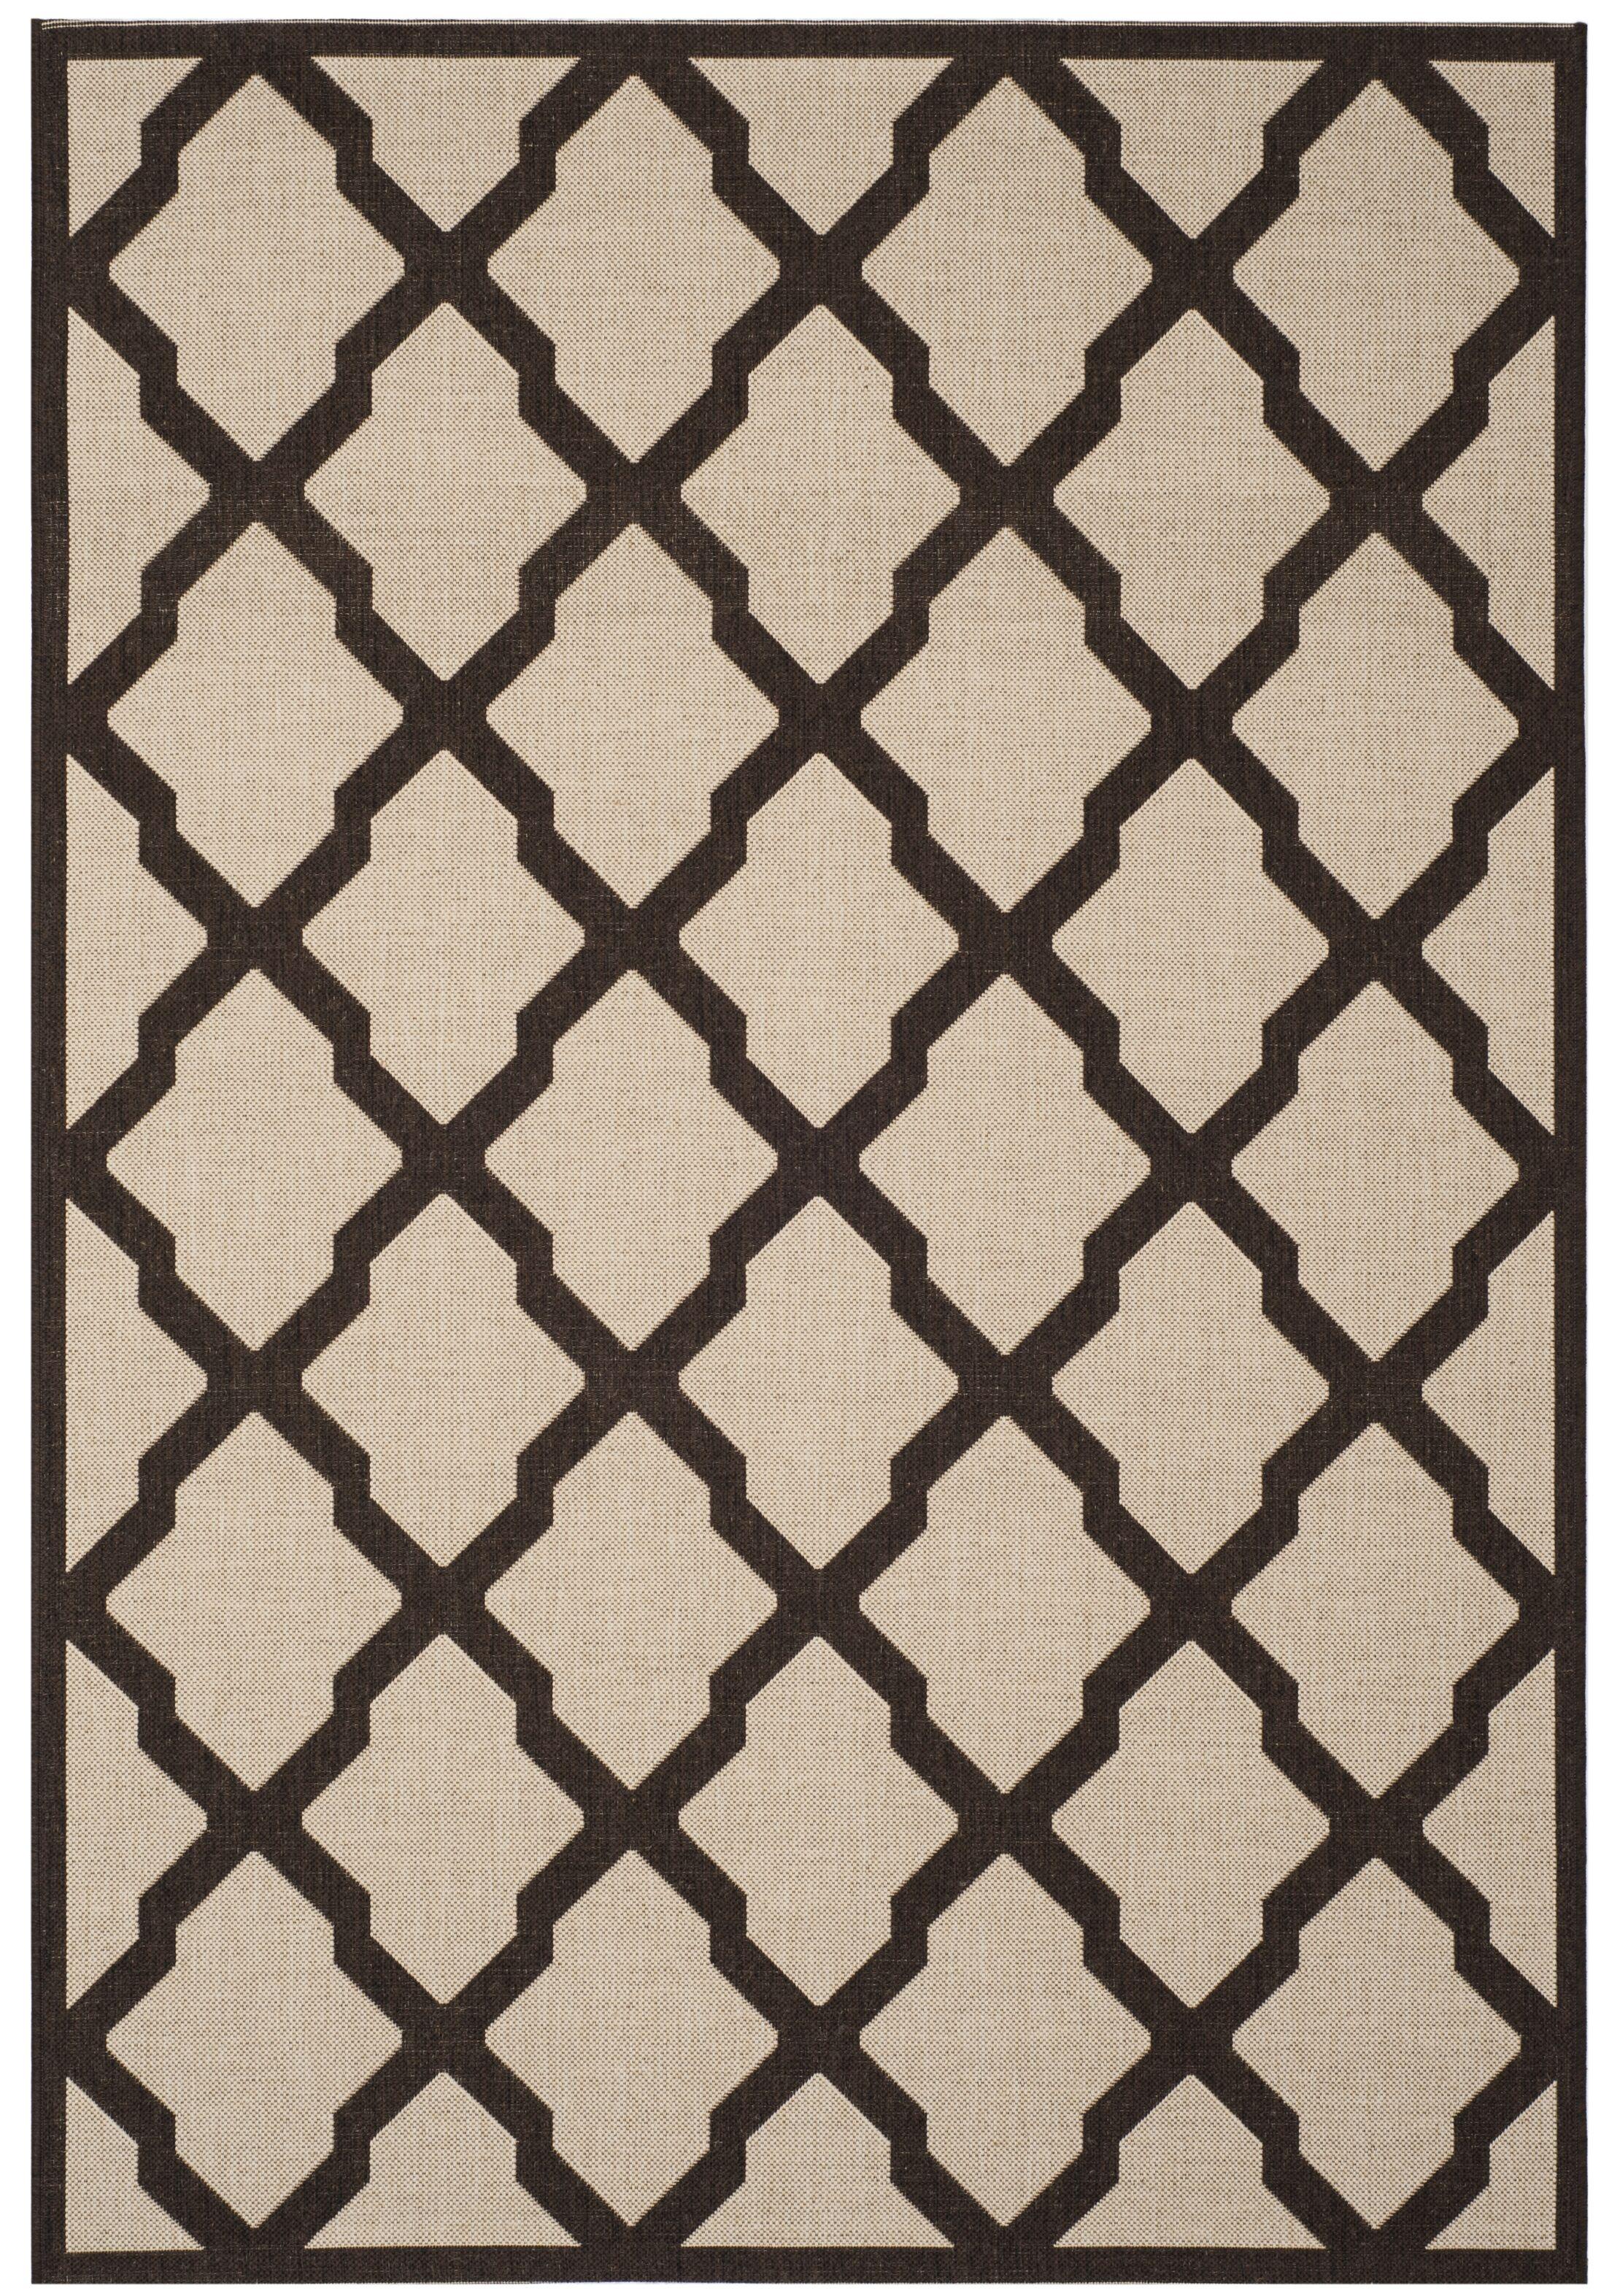 Kinsley Natural Area Rug Rug Size: Rectangle 5'1